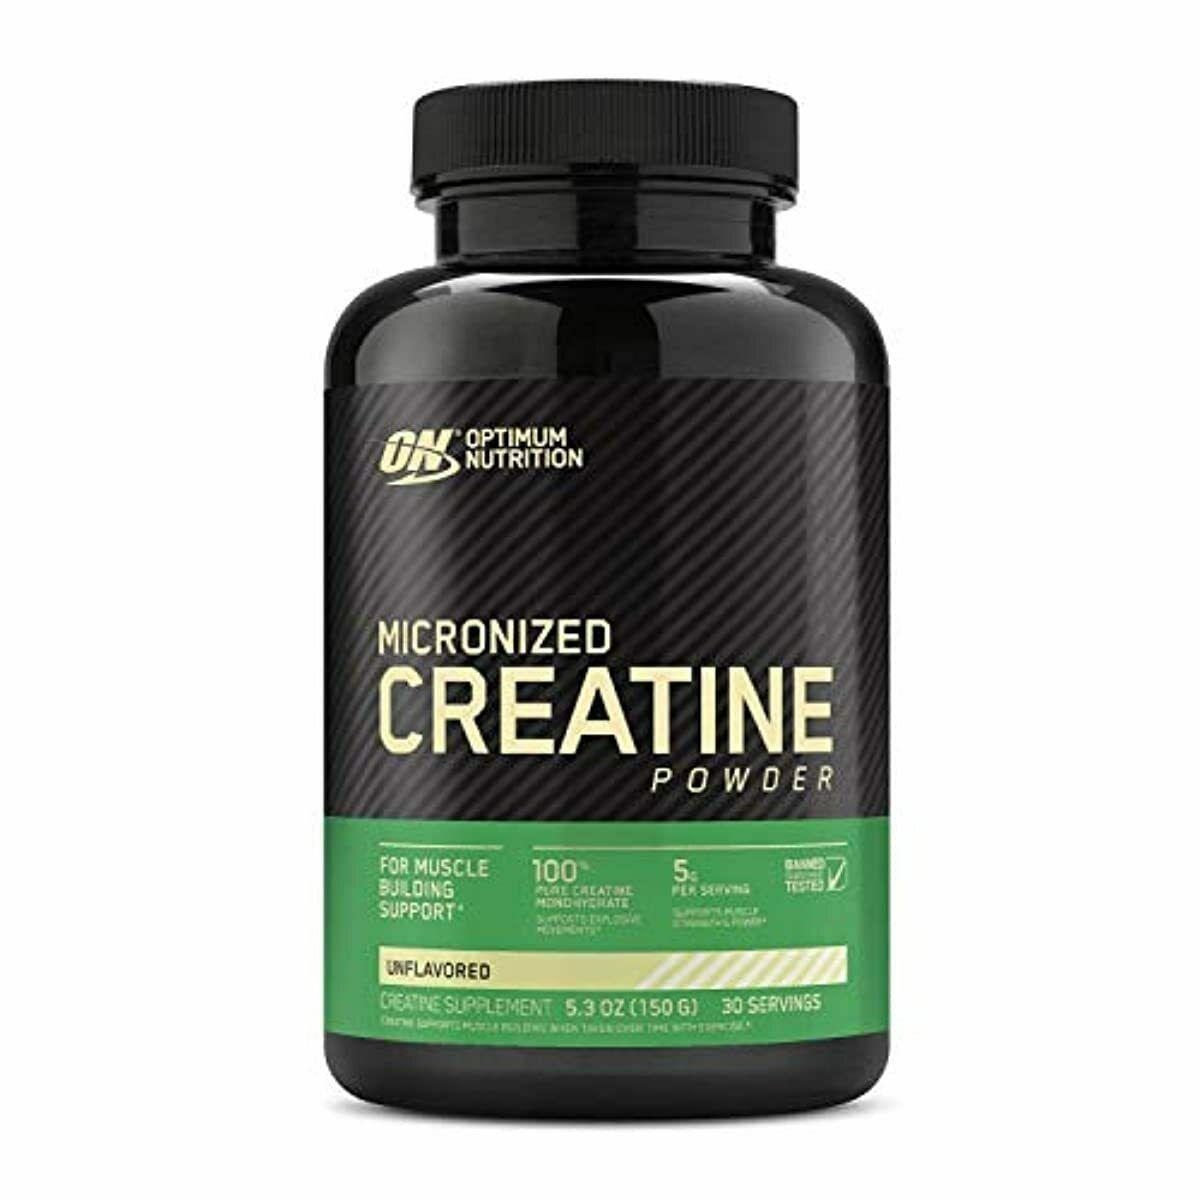 Обзор креатина micronized creatine powder от компании optimum nutrition